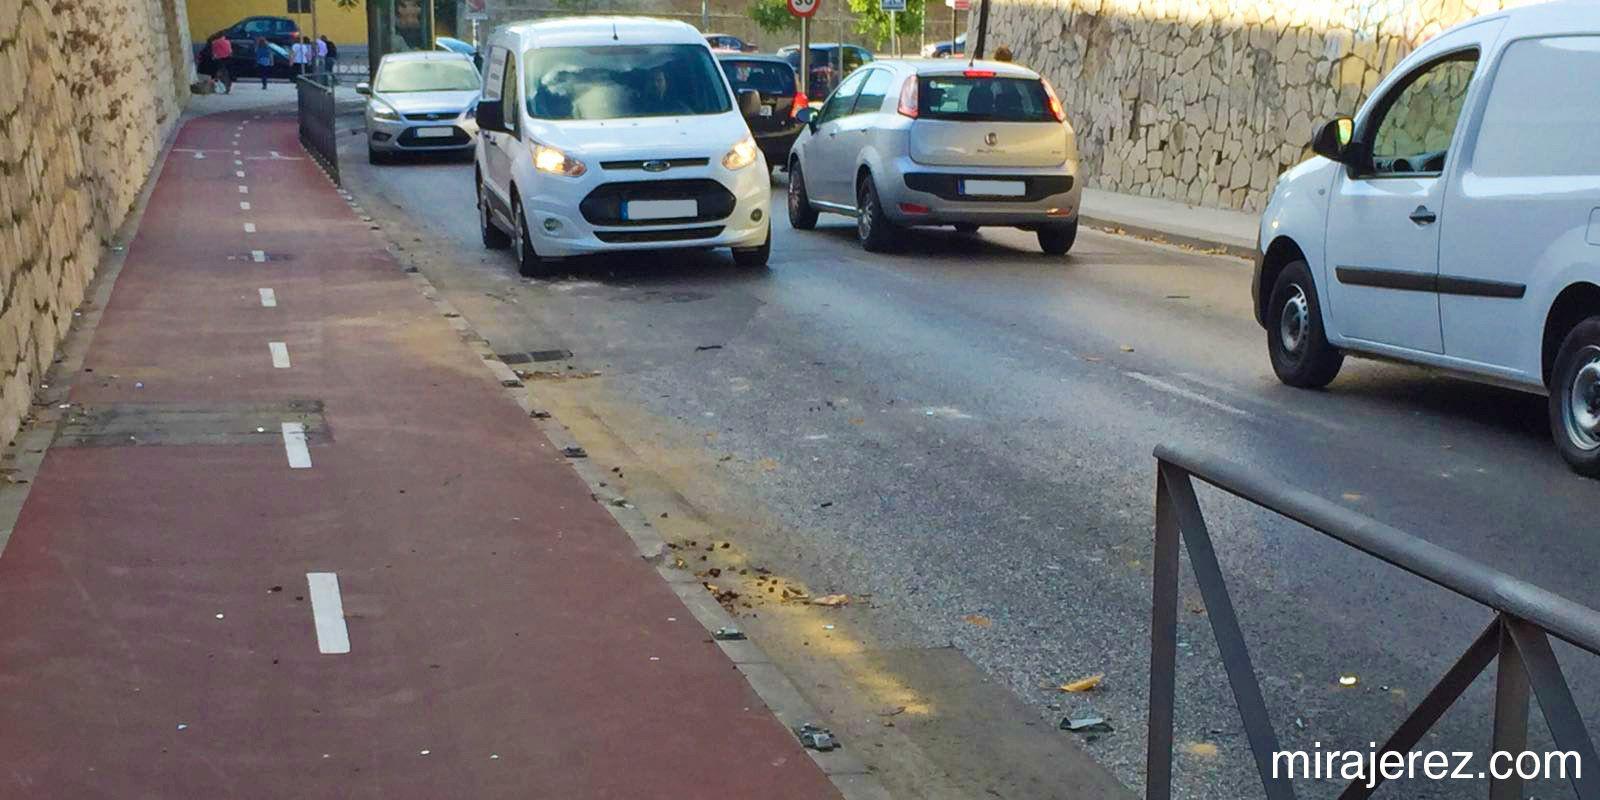 accidente carril bici jerez 1